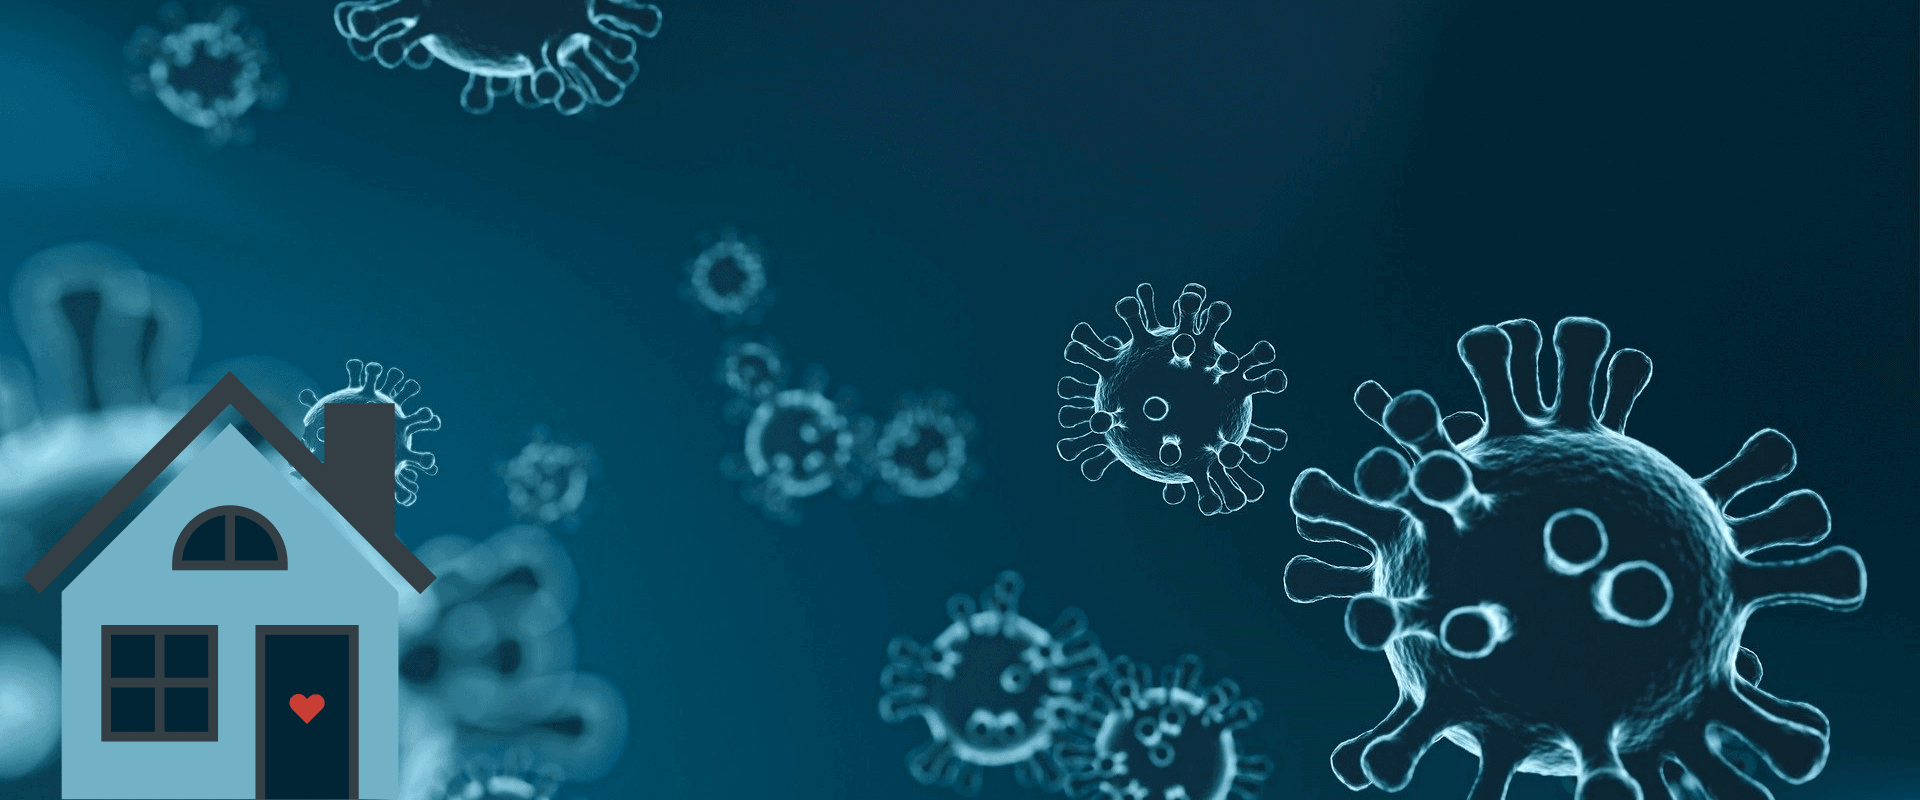 coronavirus impact on real estate